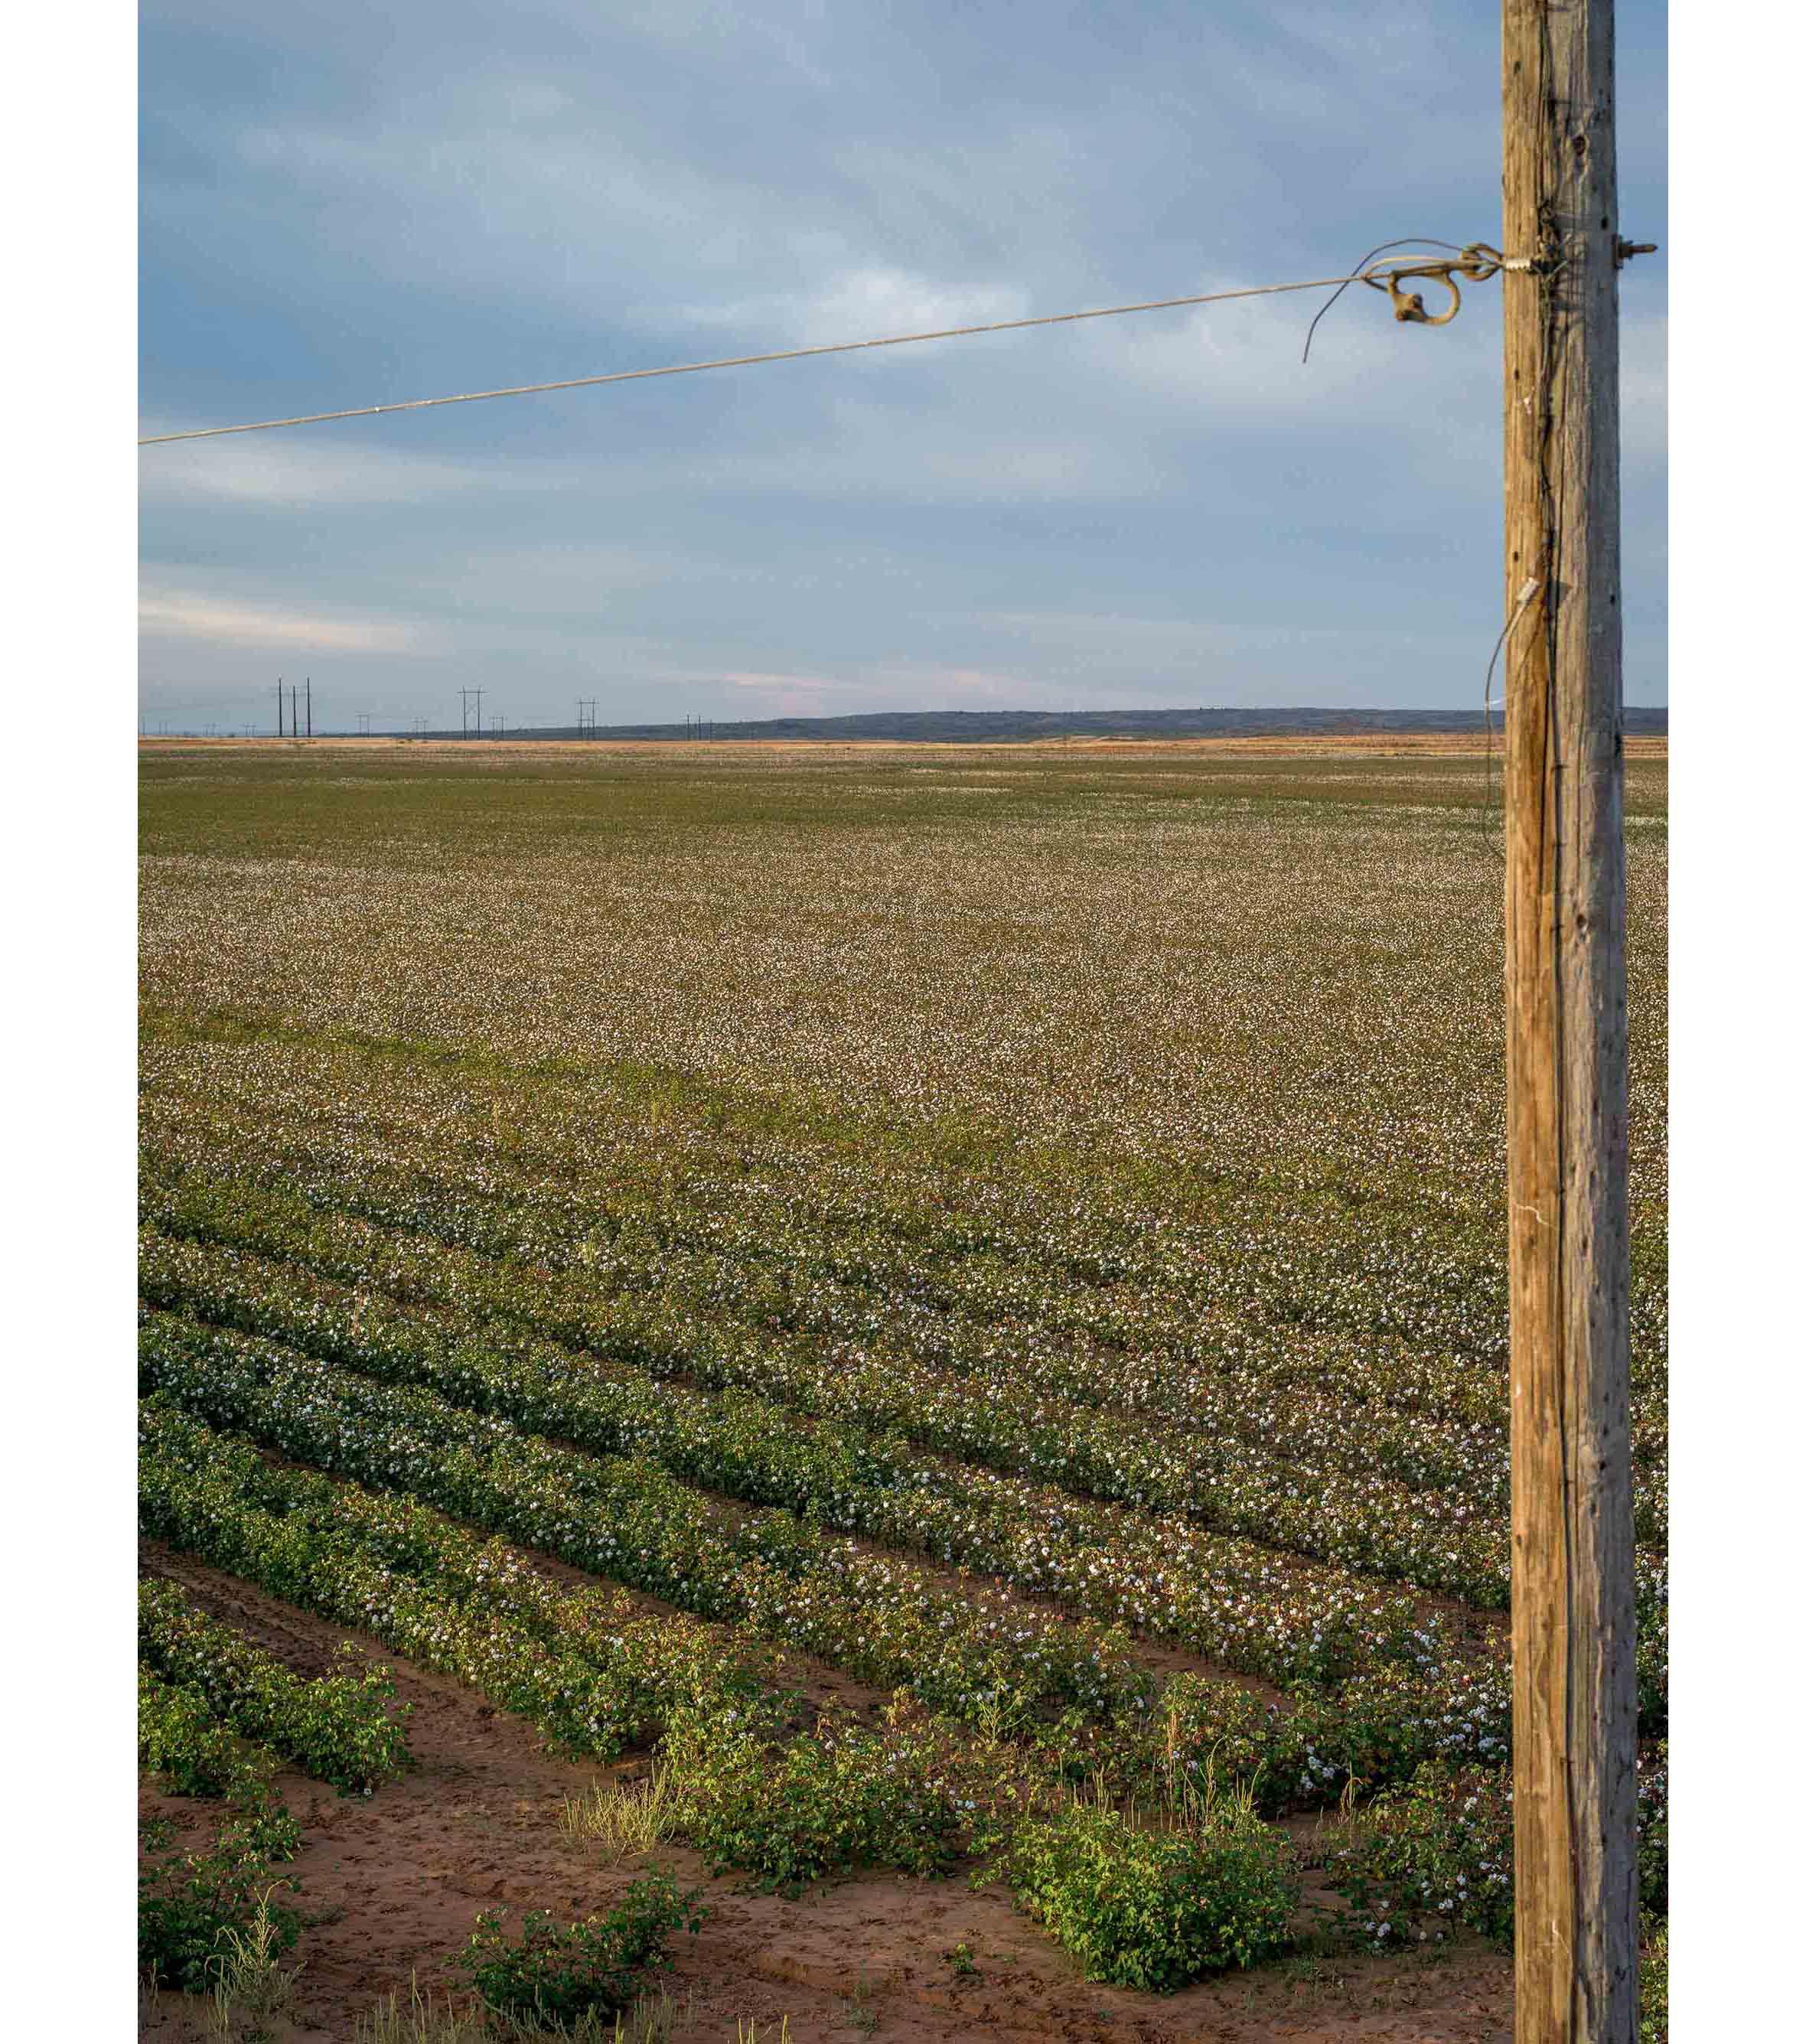 Cottonfields08.jpg